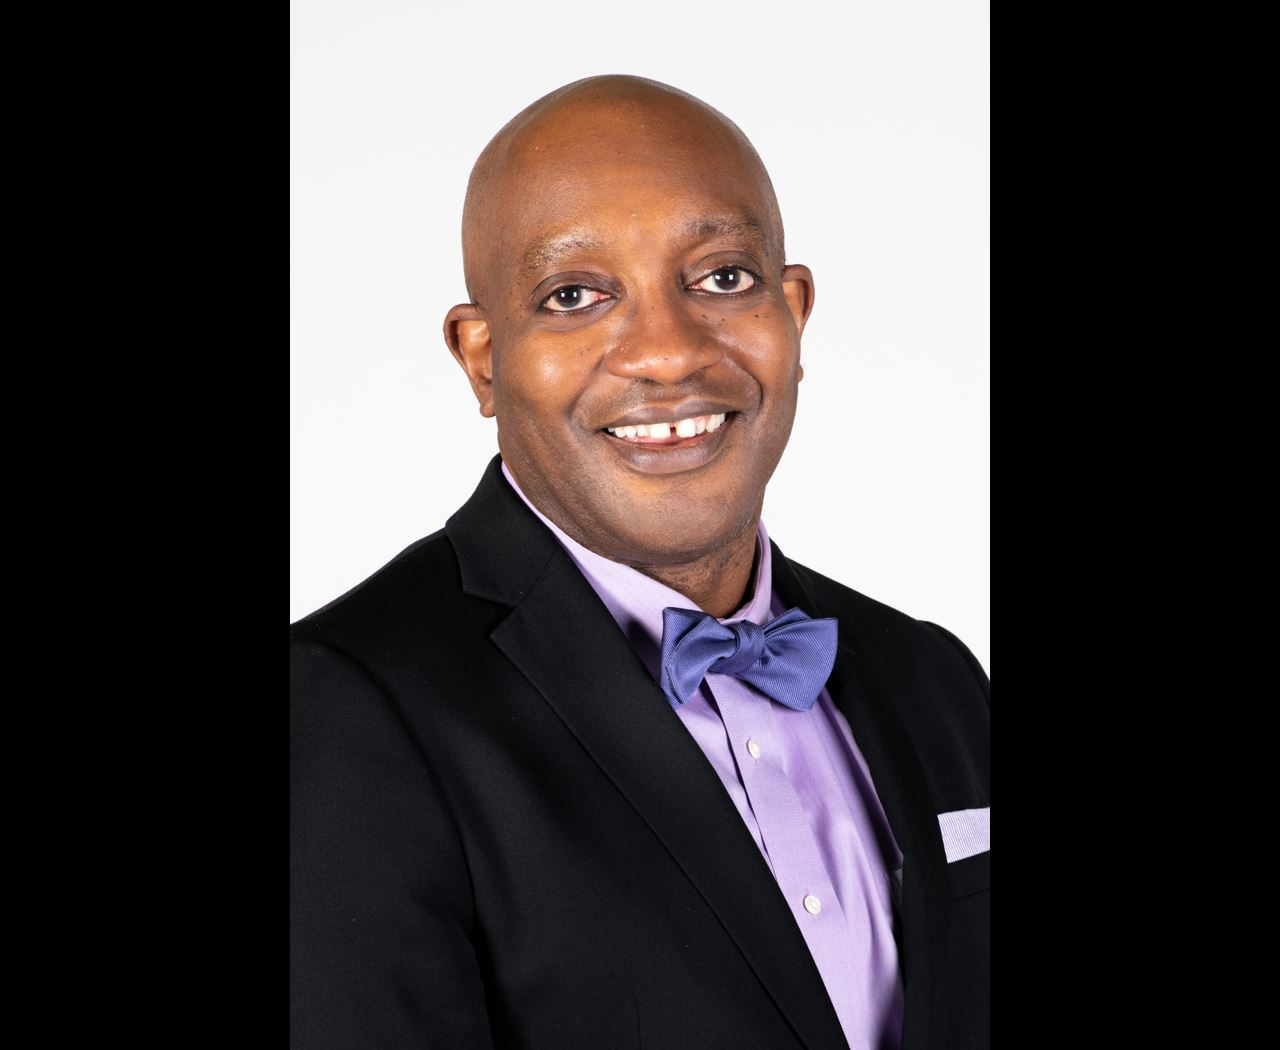 Headshot of Patrick Okolo, MD